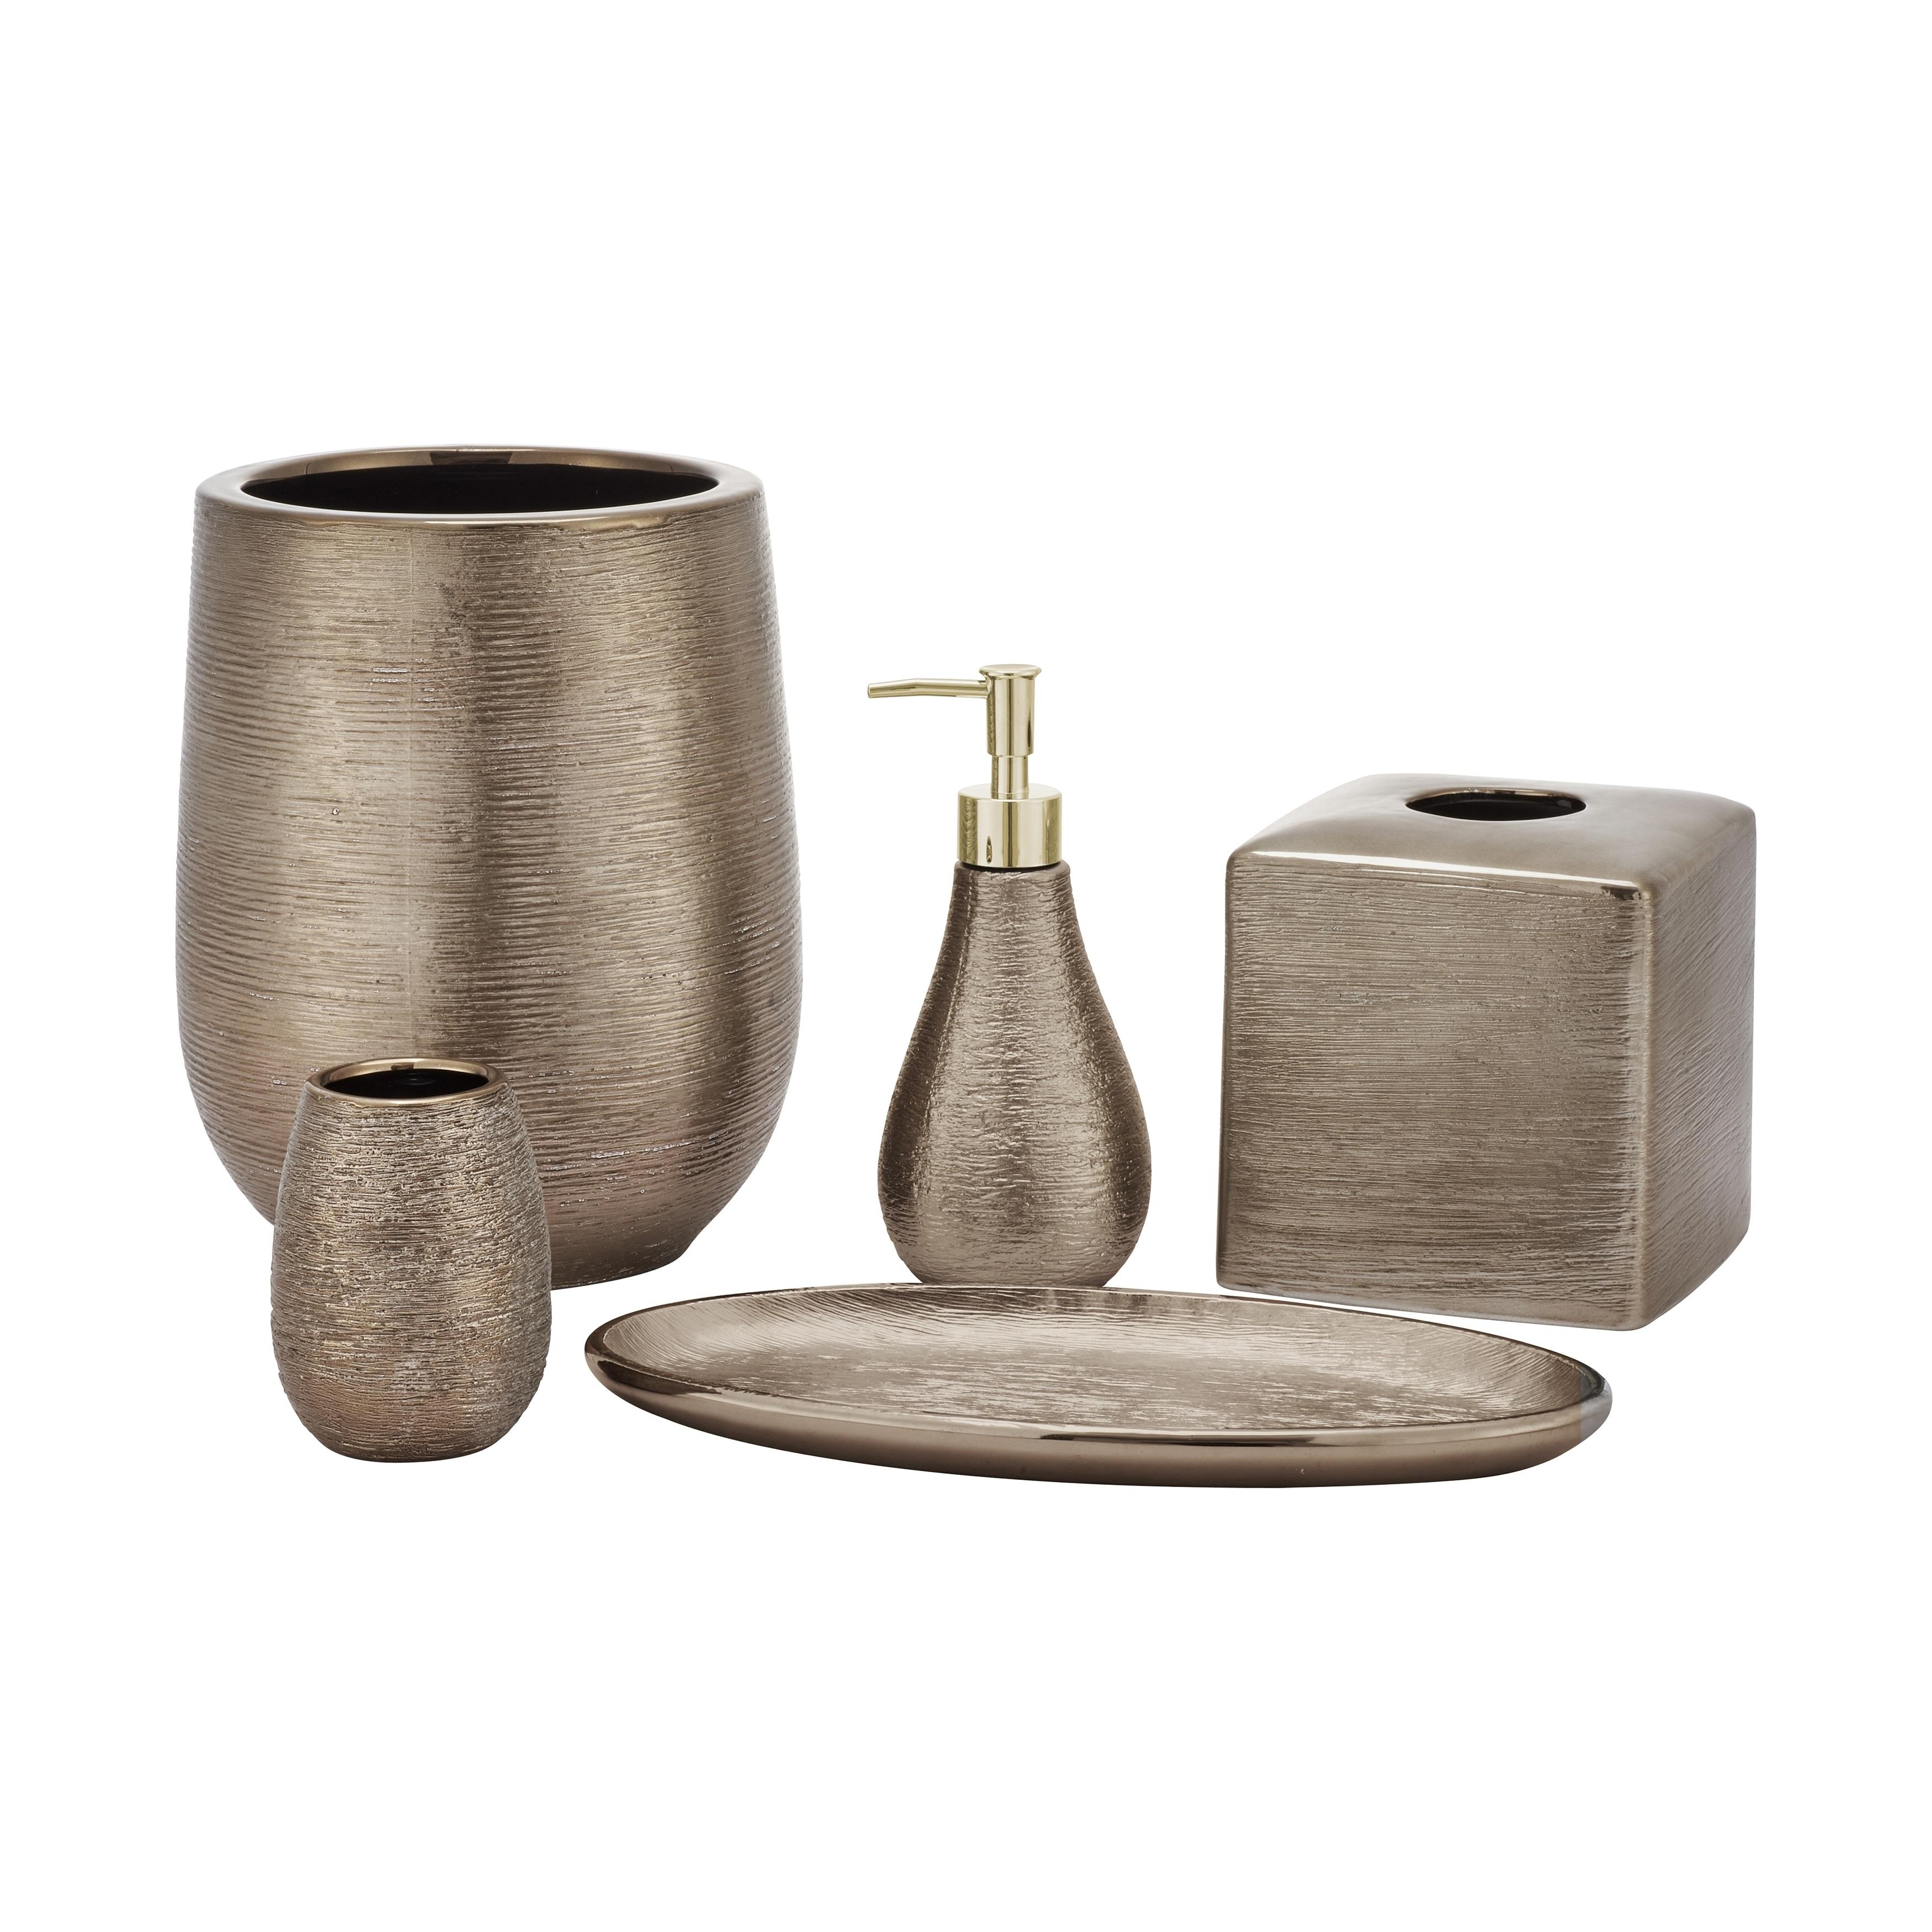 Shop five queens court priscilla bronze stoneware bathroom accessories free shipping today overstock com 22612279